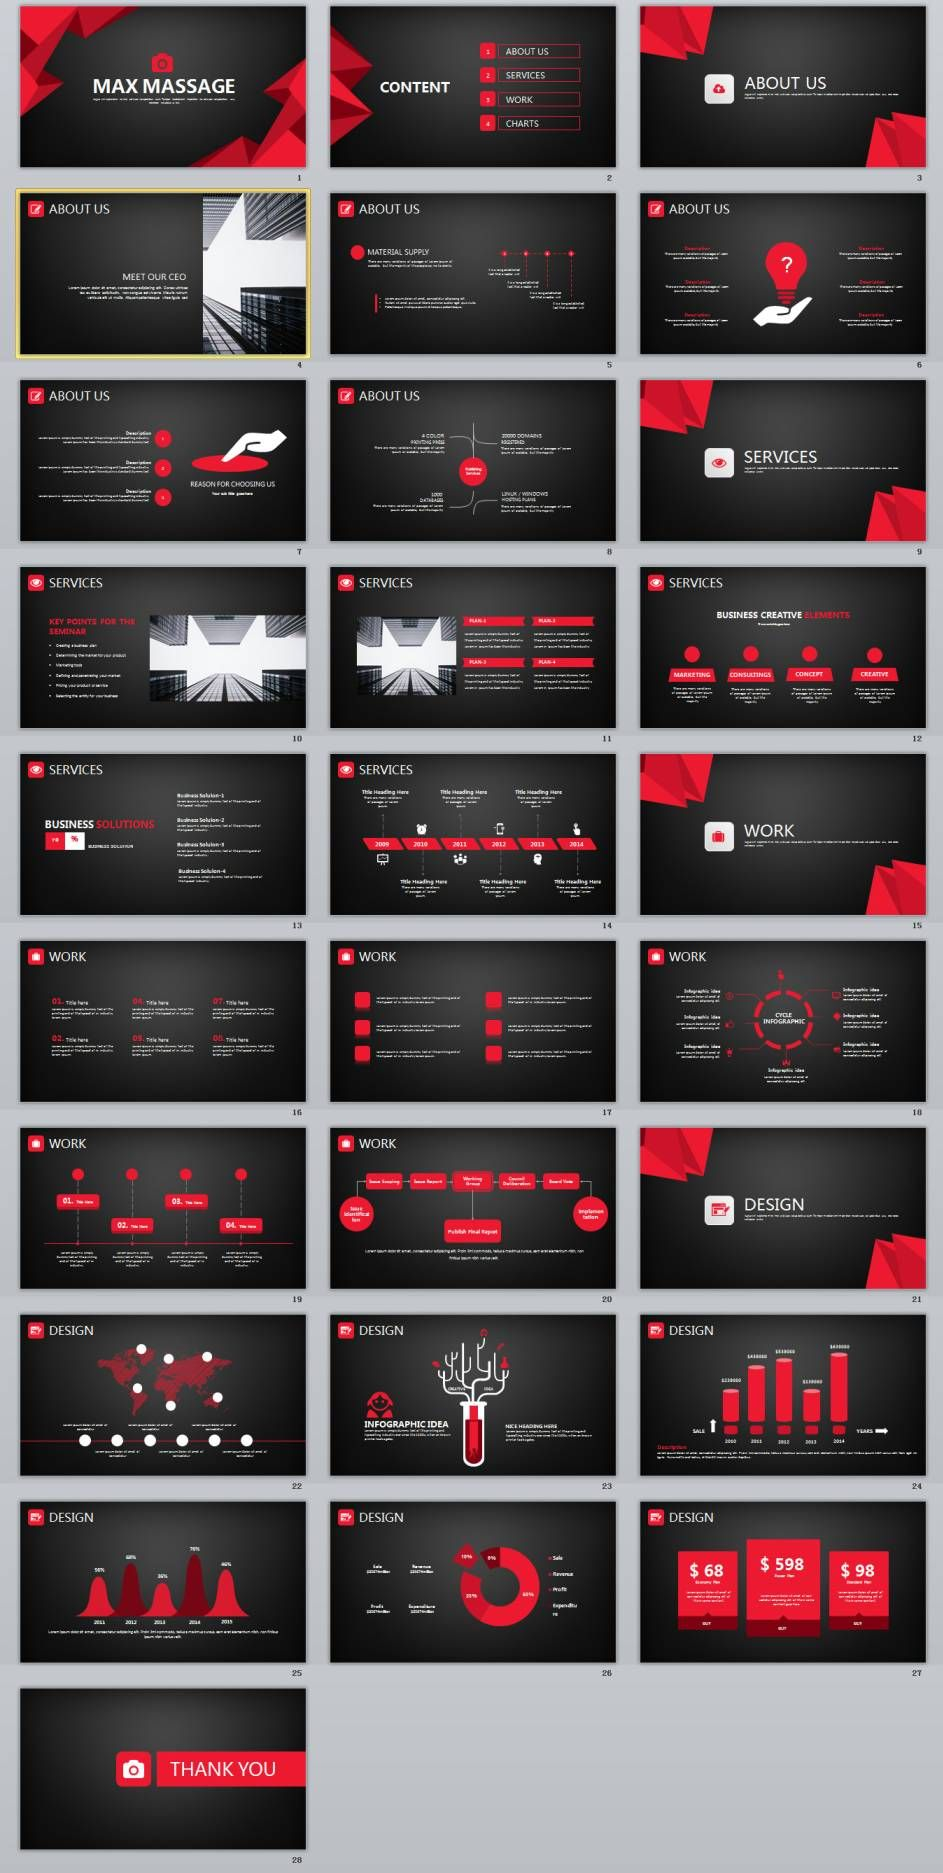 2017 best powerpoint templates 2017 best powerpoint templates the highest quality powerpoint templates and keynote templates download toneelgroepblik Image collections